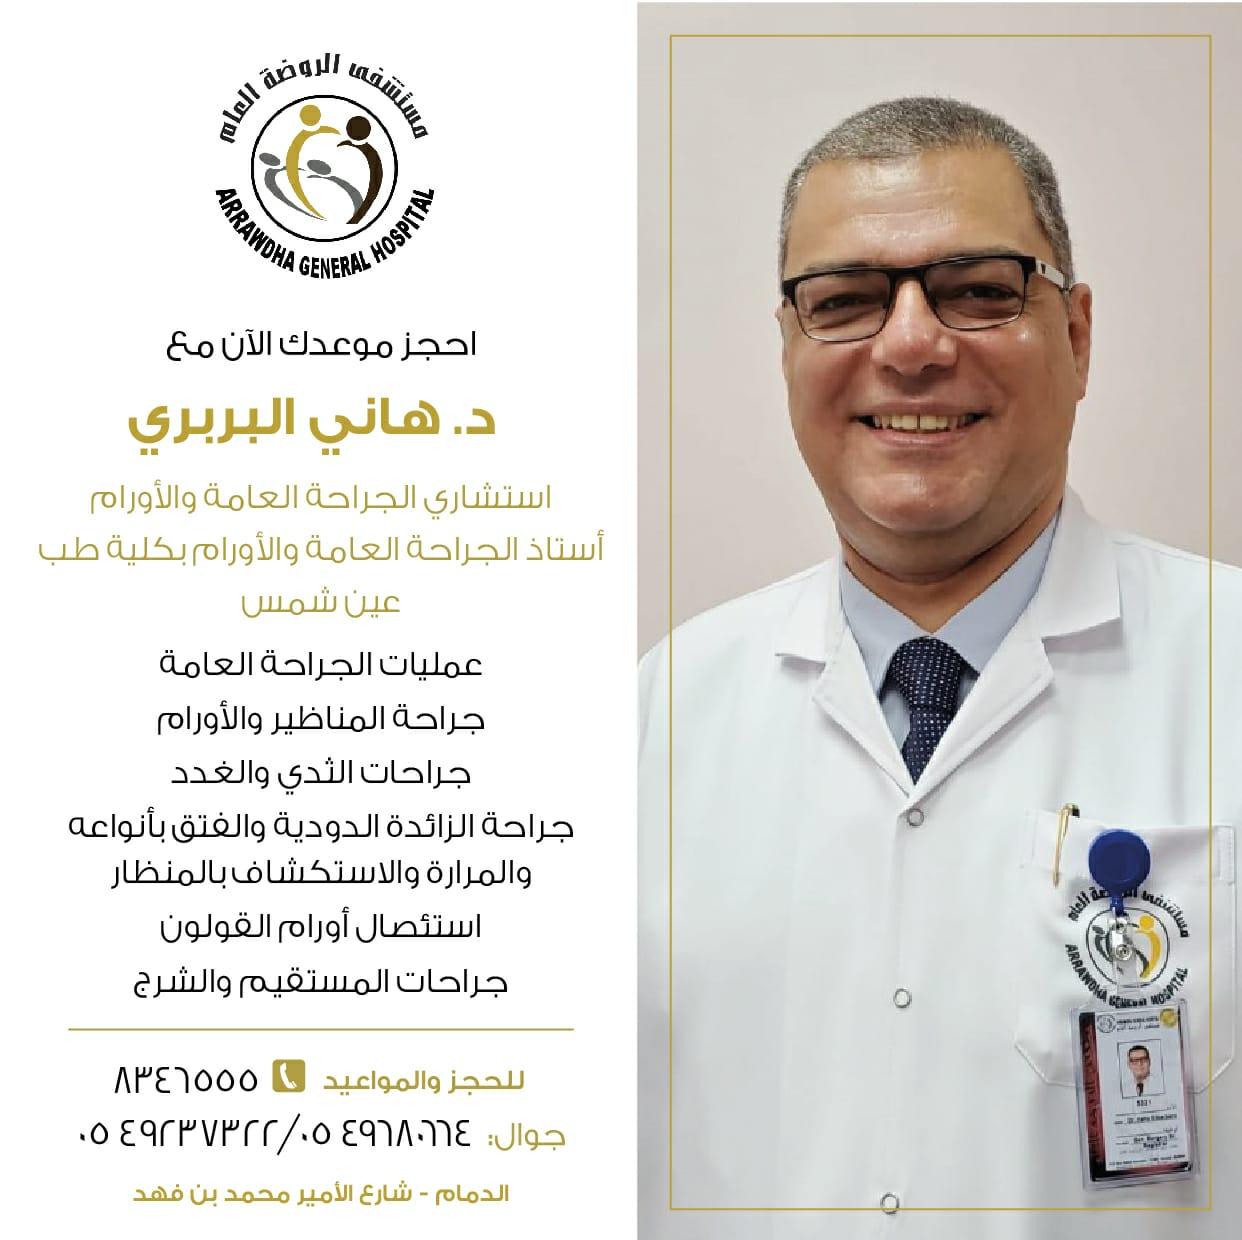 Dr. Hany El Barbari